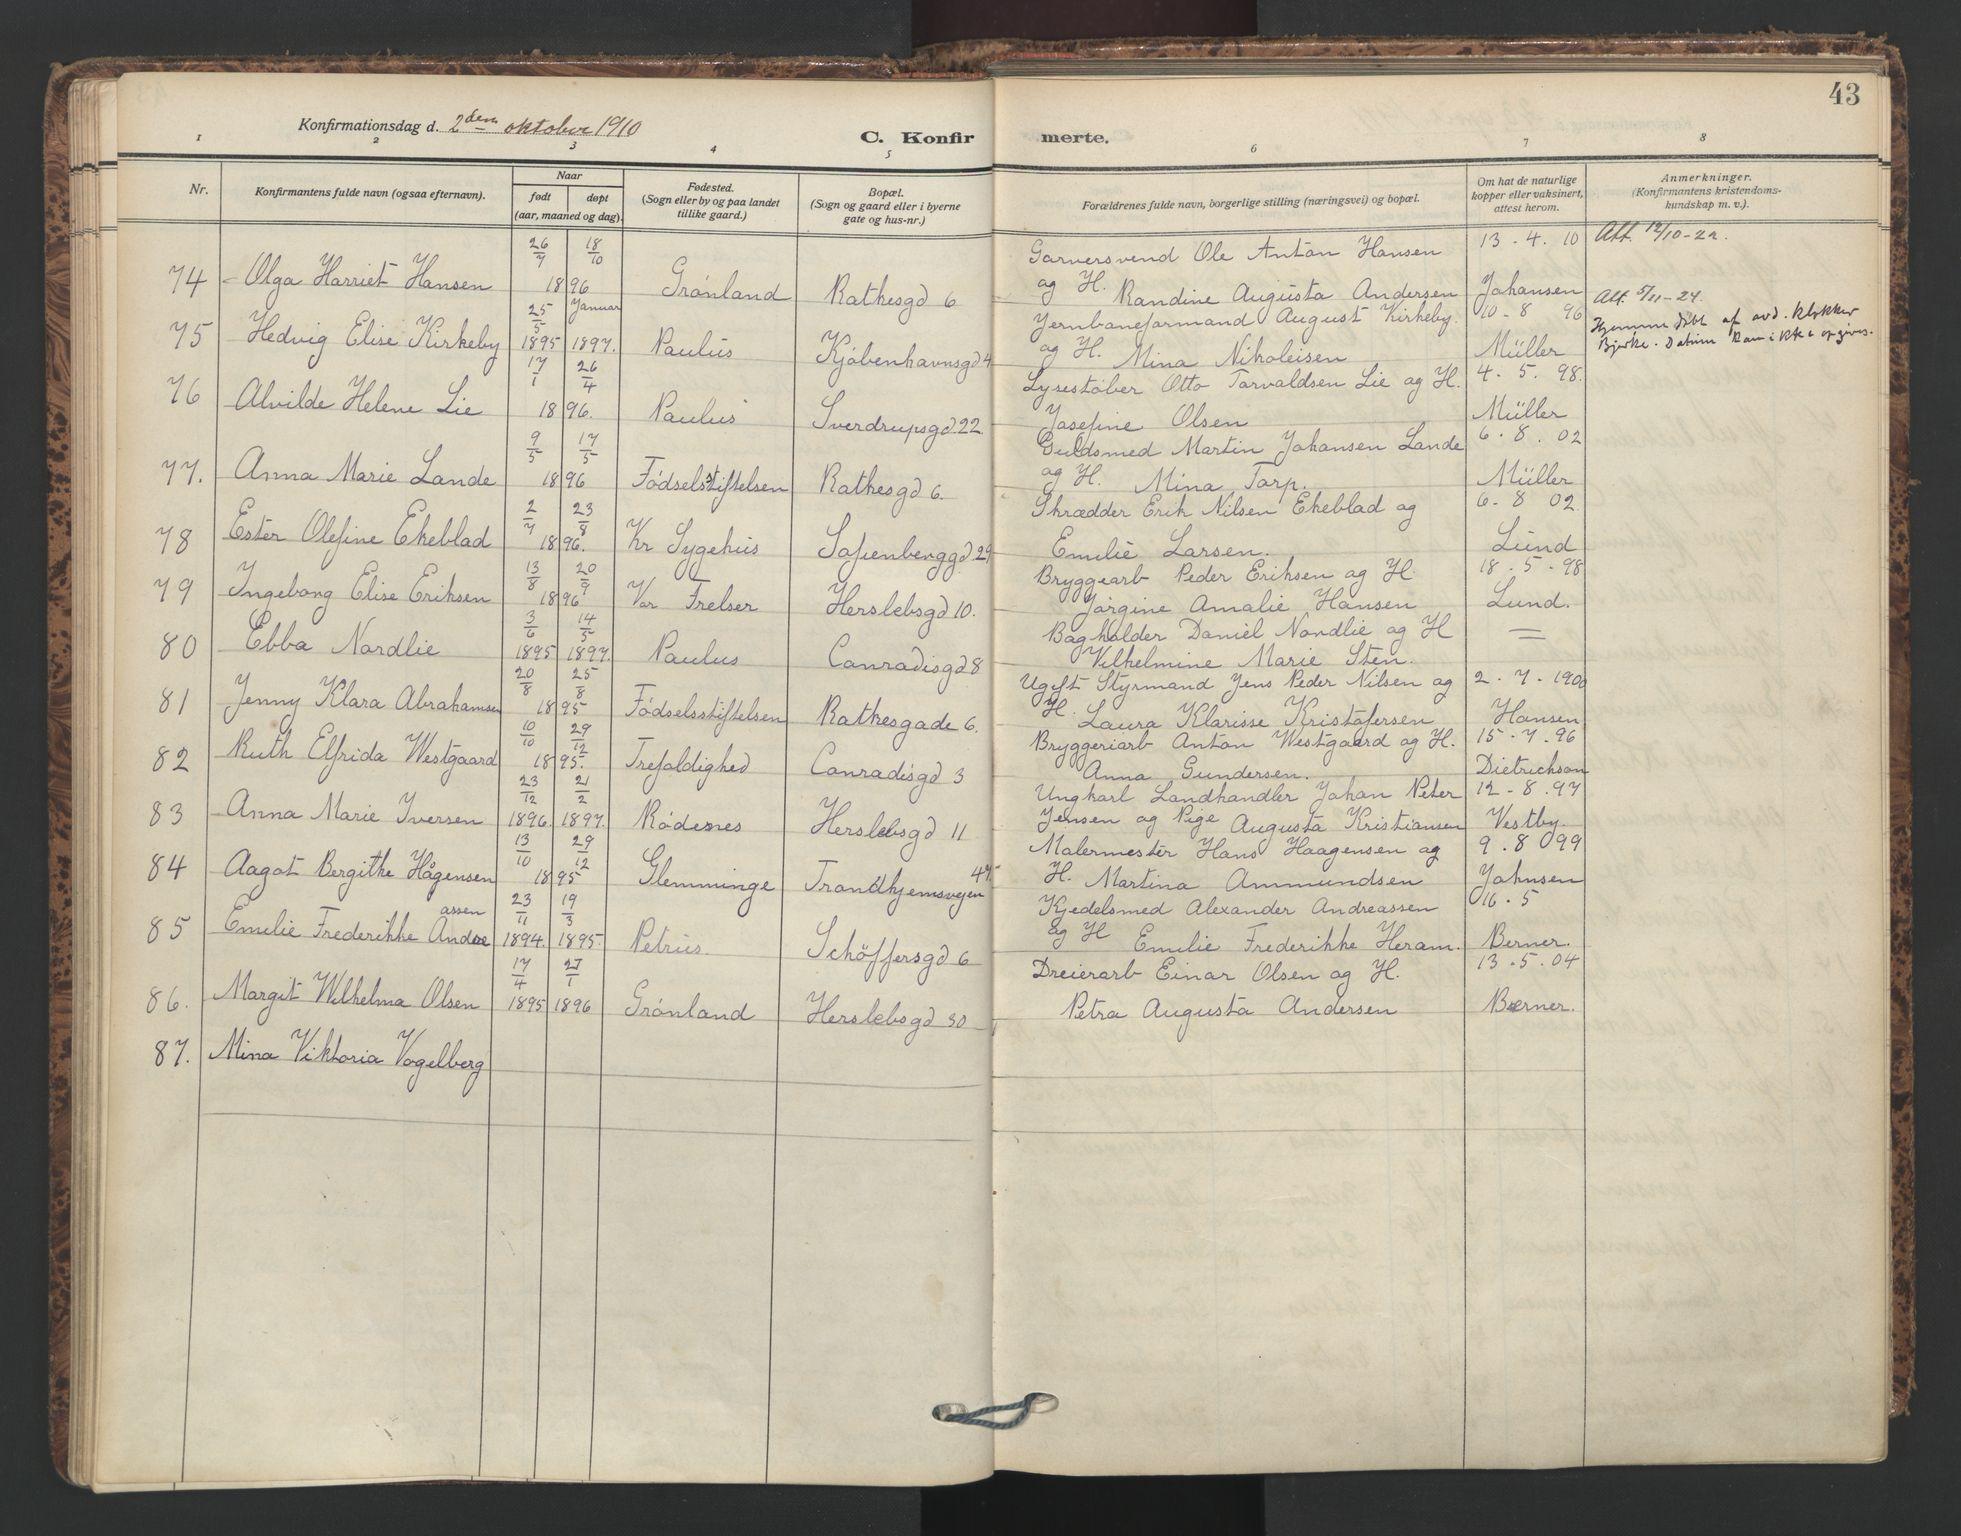 SAO, Petrus prestekontor Kirkebøker, F/Fa/L0011: Parish register (official) no. 11, 1908-1922, p. 43